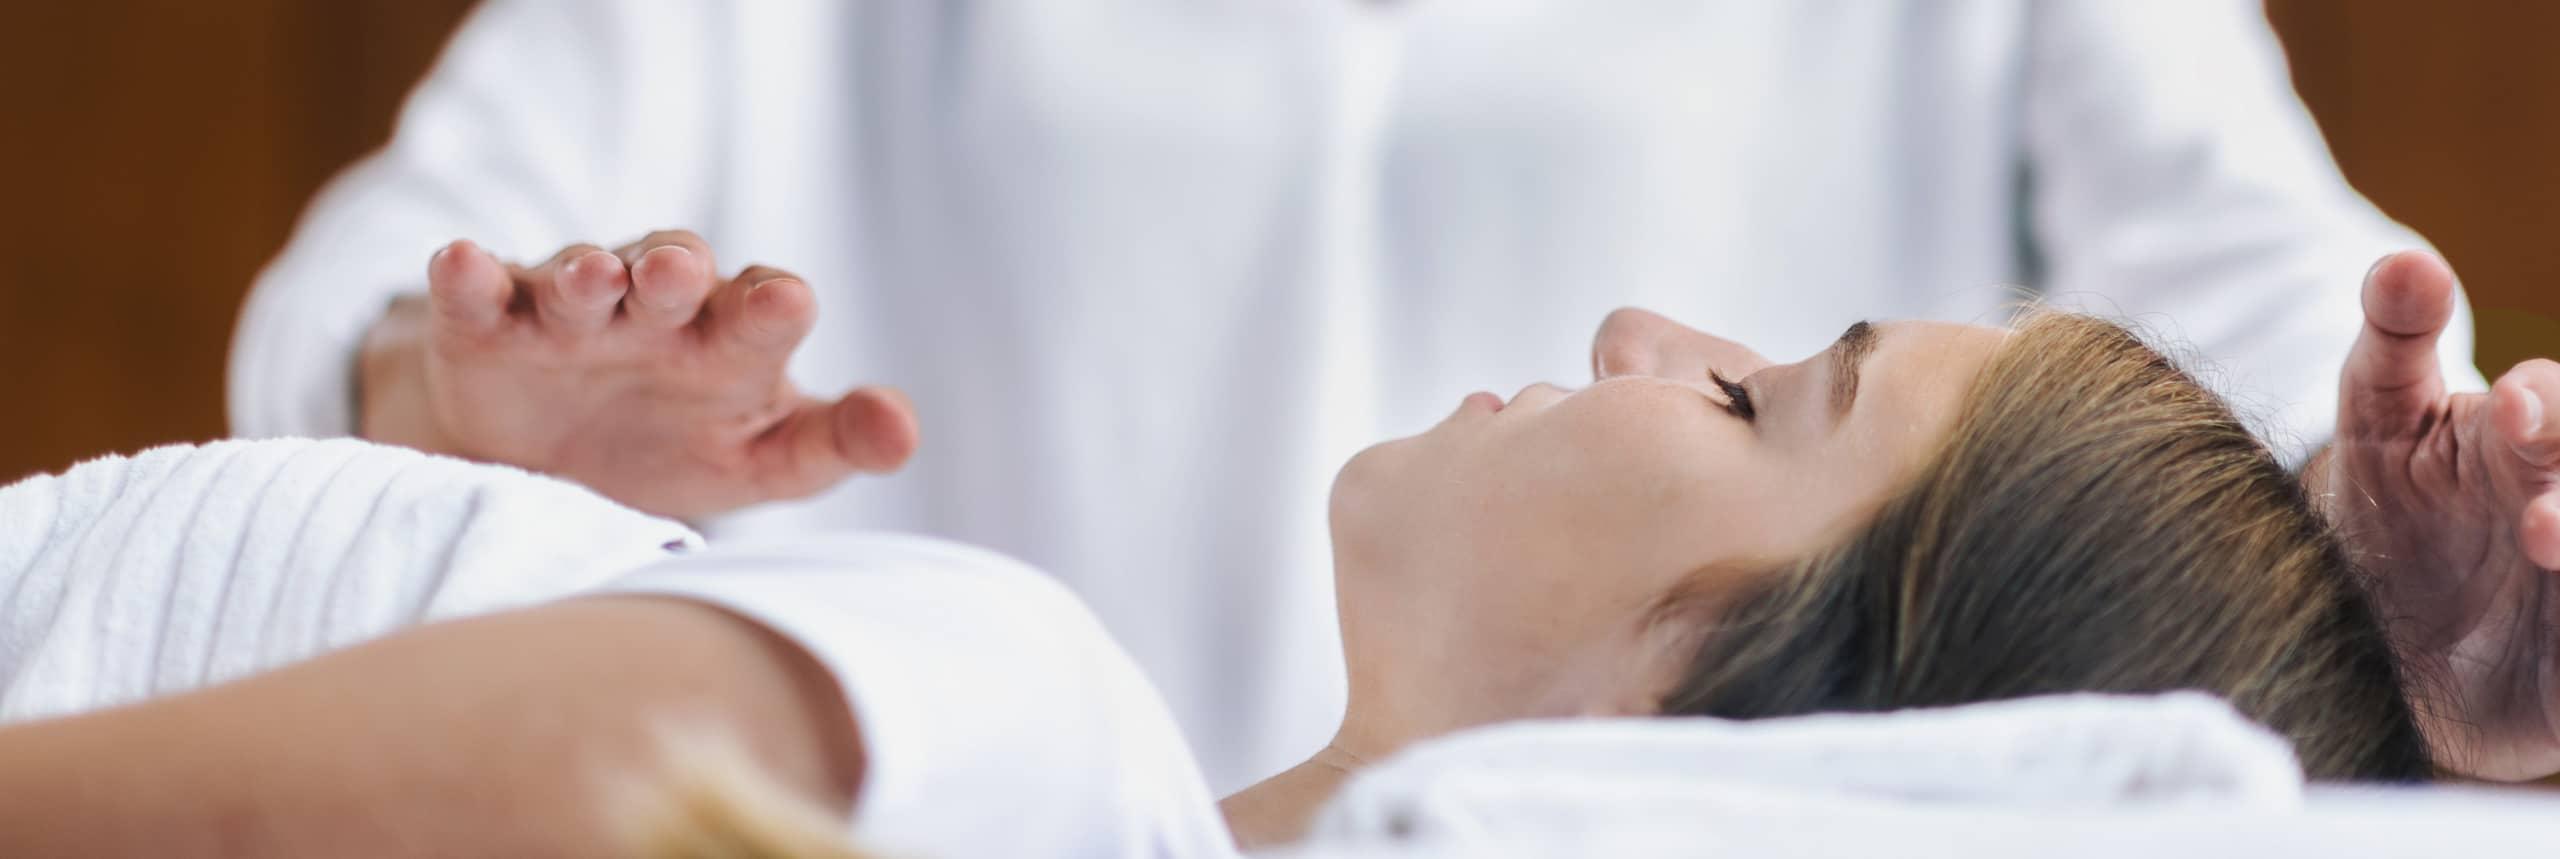 Reiki Healing Session With Teenage Girl